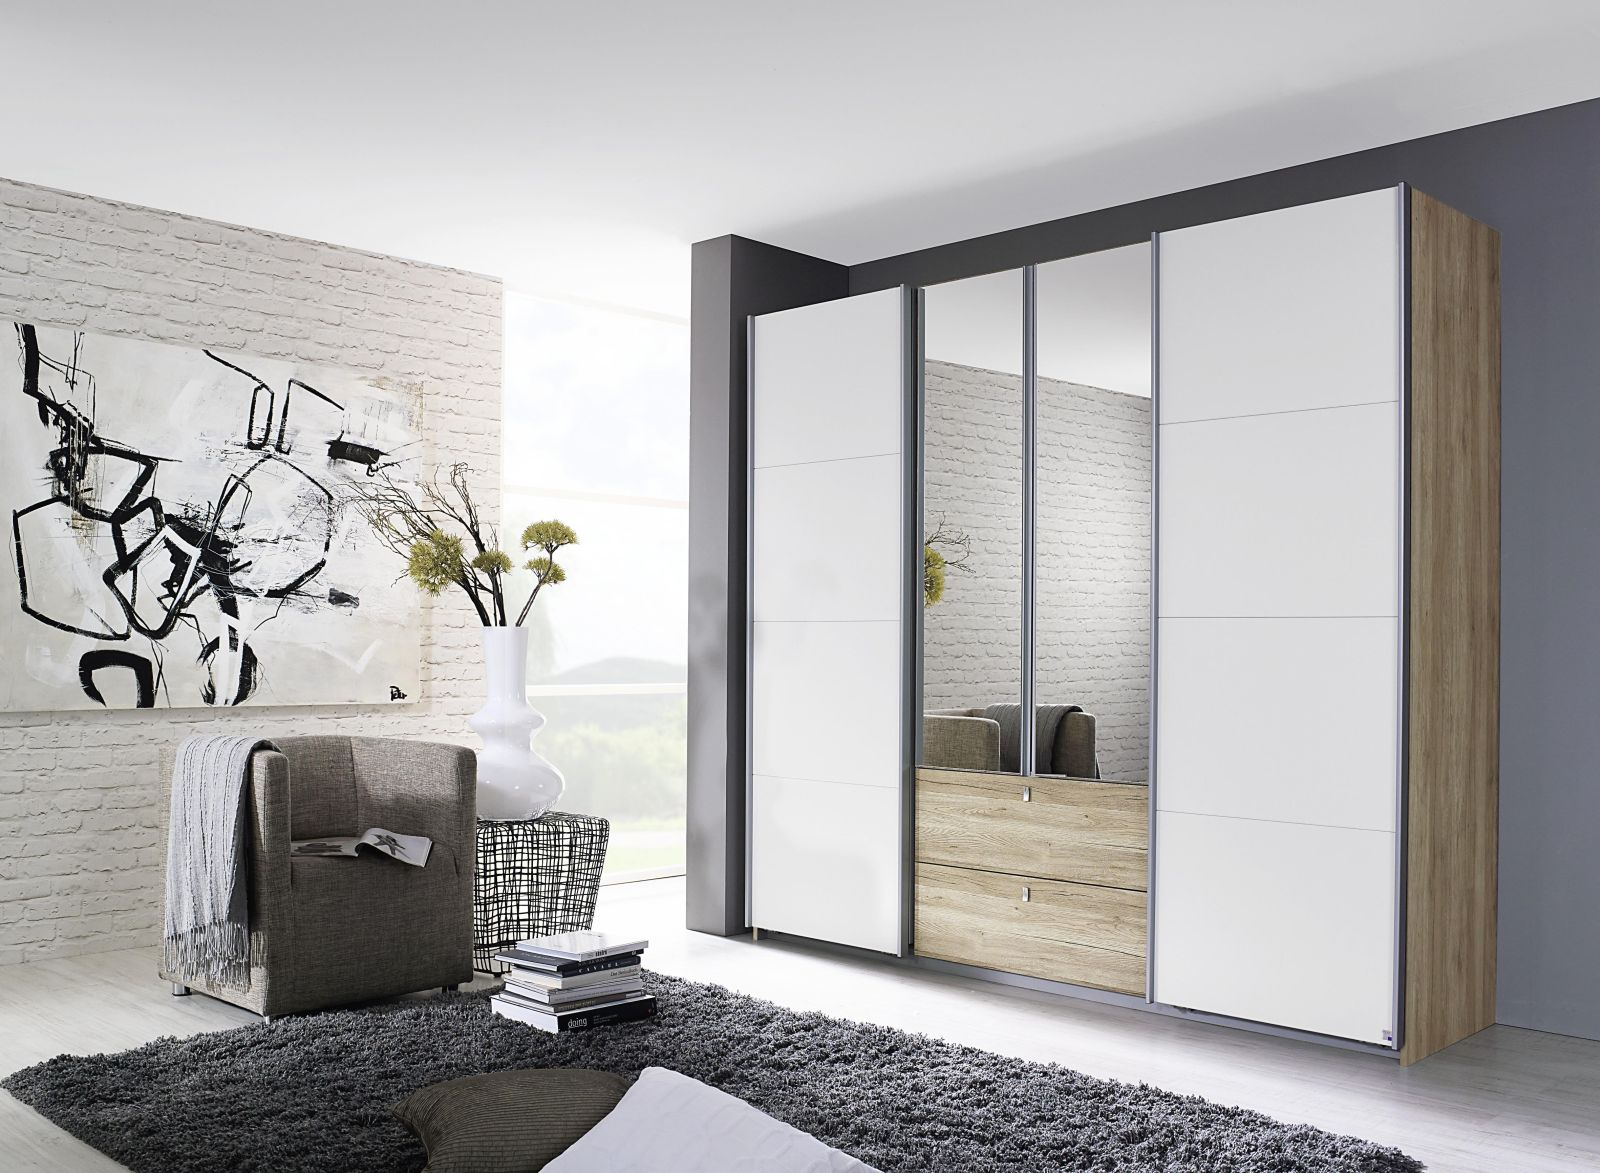 schwebet renschrank kombino kleiderschr nke. Black Bedroom Furniture Sets. Home Design Ideas